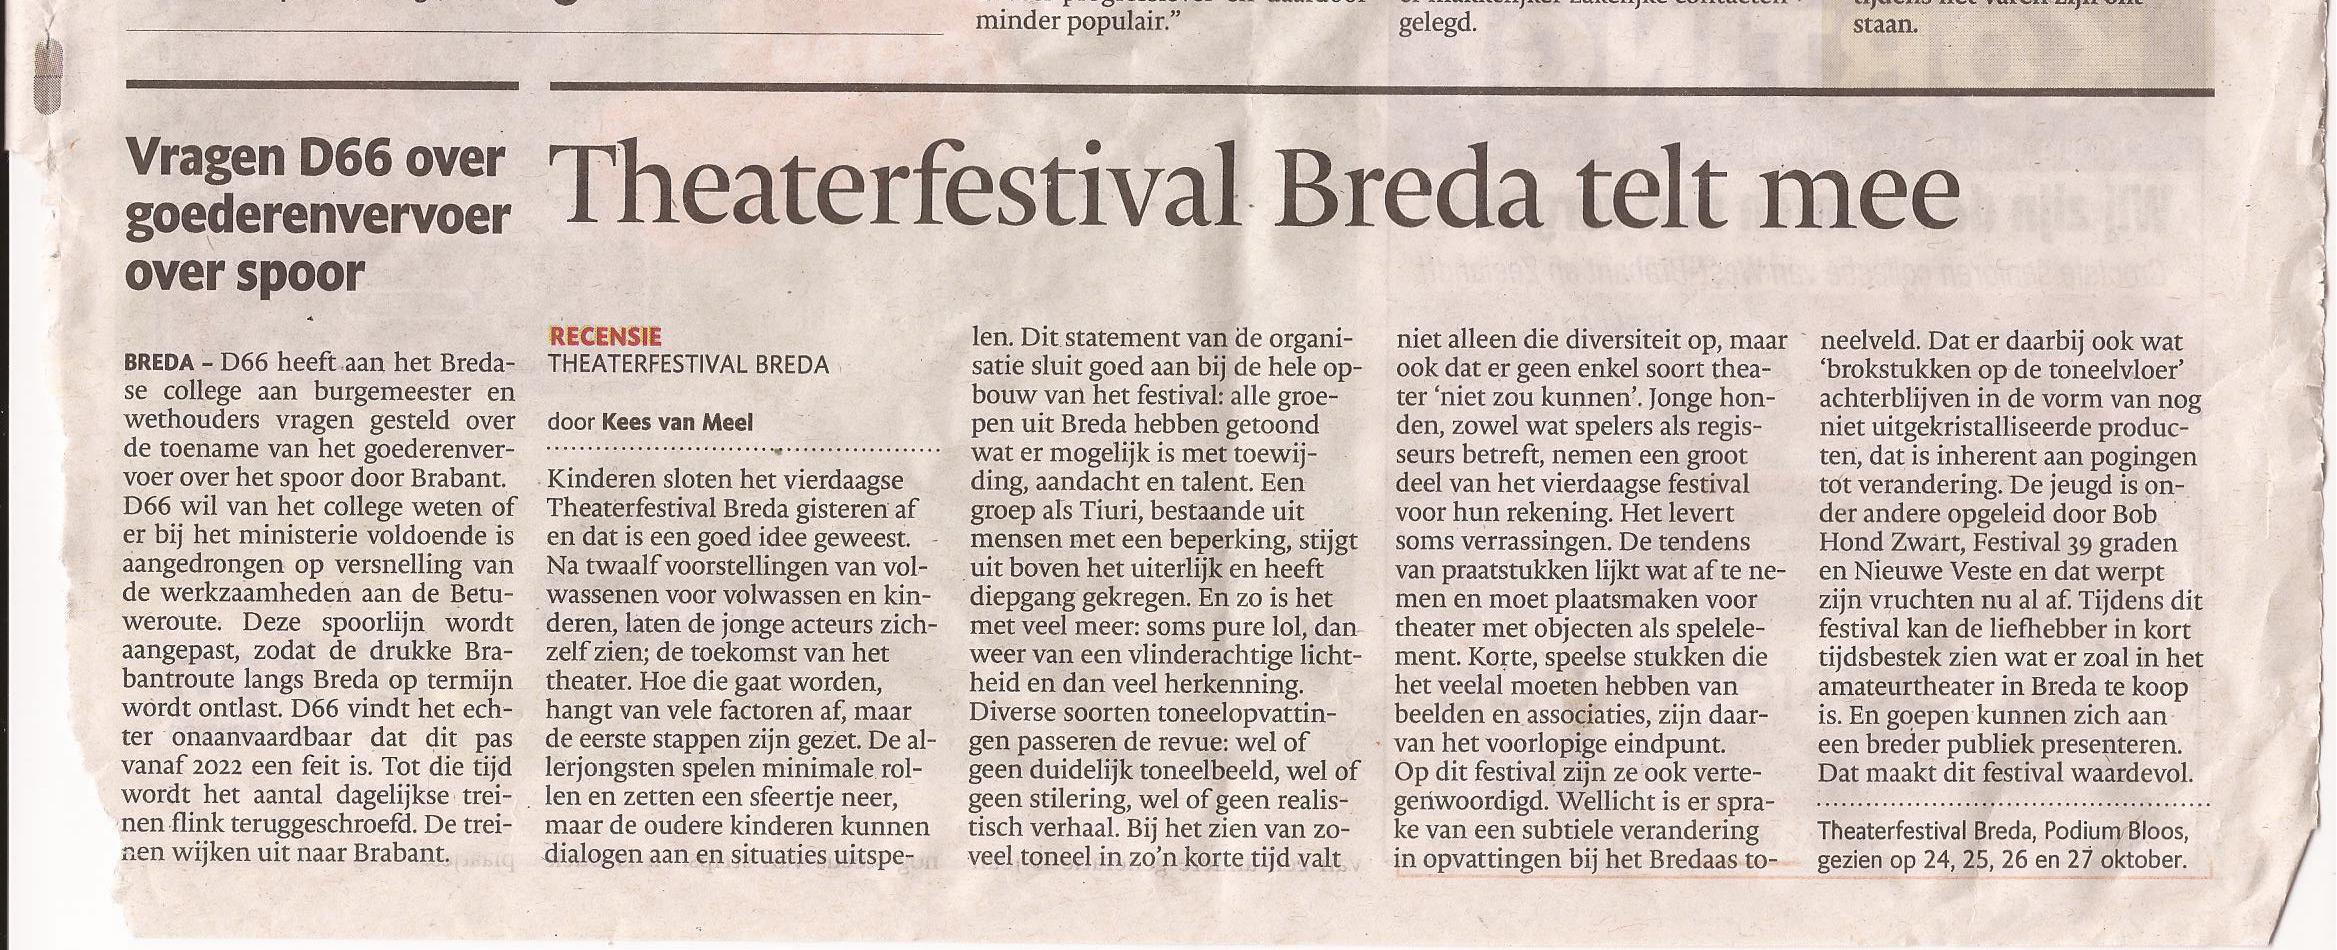 Recensie Theaterfestival Breda - okt. 2013